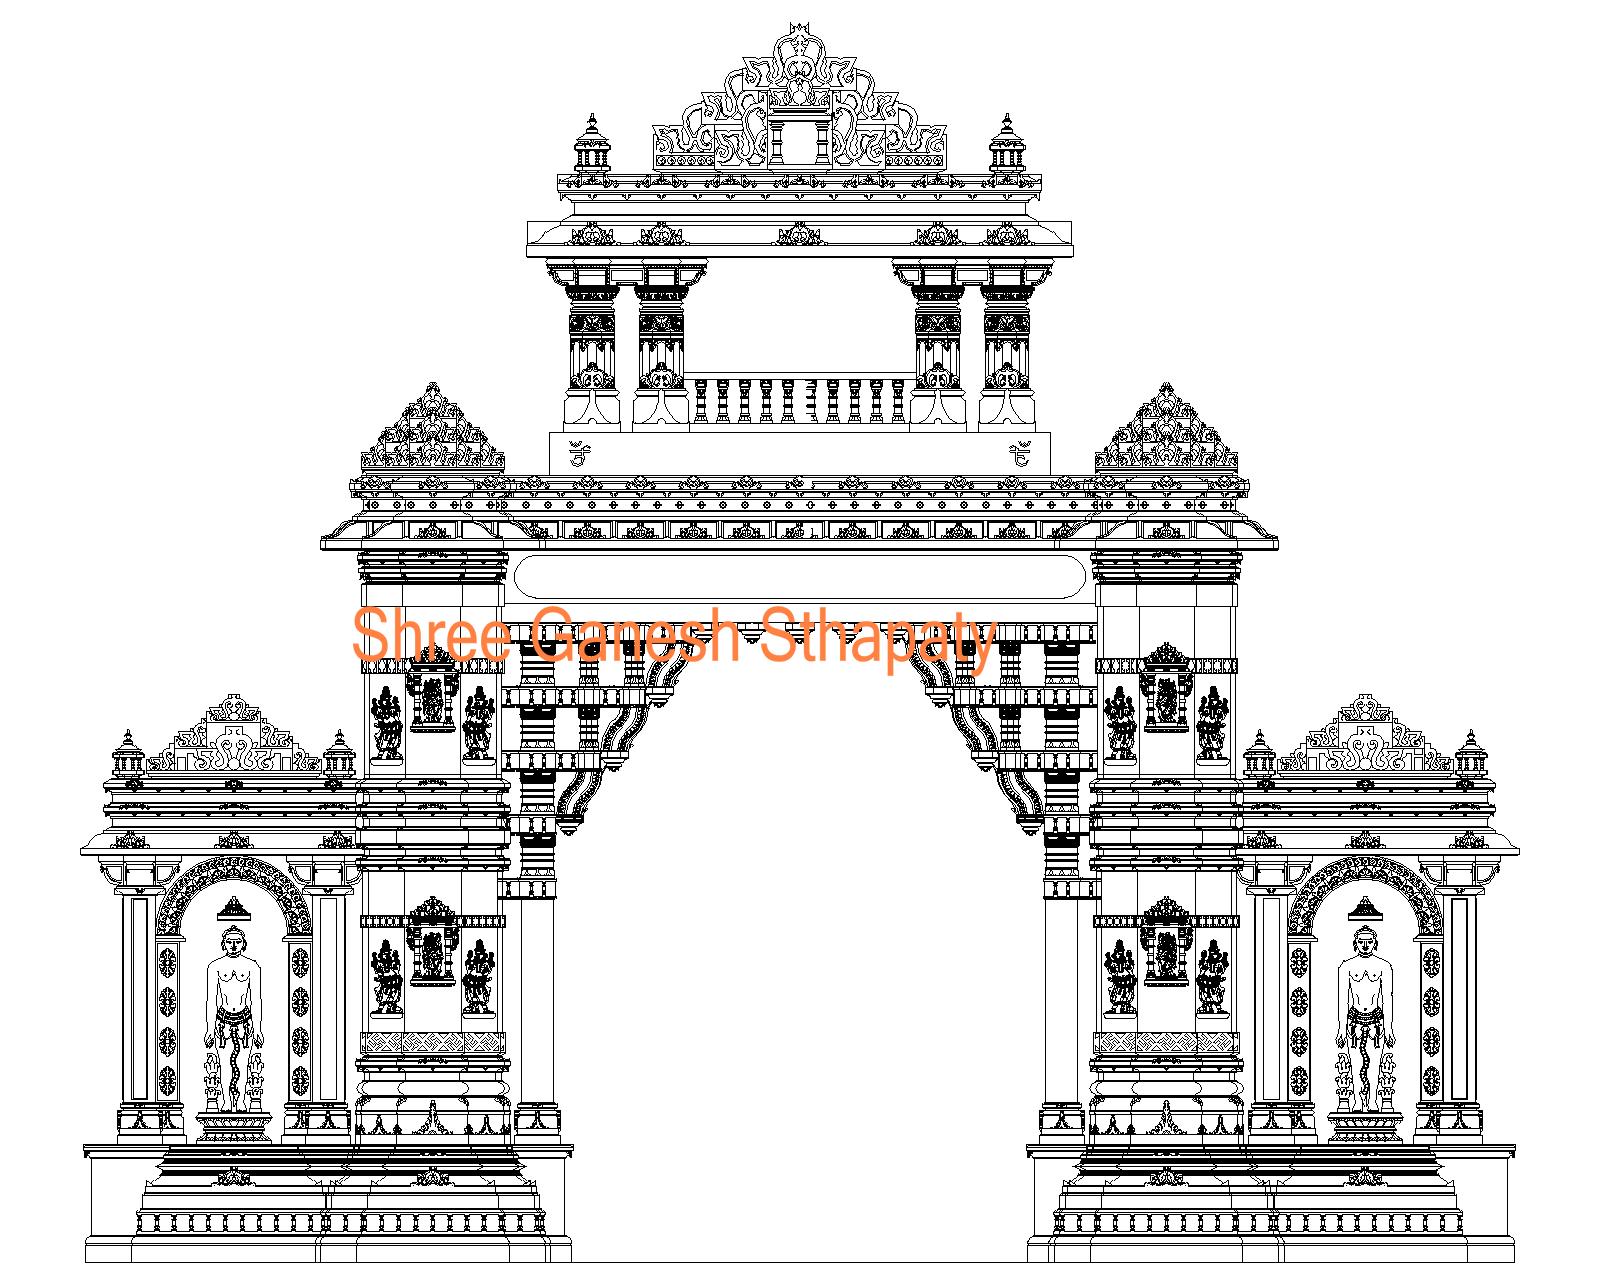 ganesh sthapatya, Shree Ganesh Society, Jogashar Road, Dhrangadhra, Gujarat, 363310, India